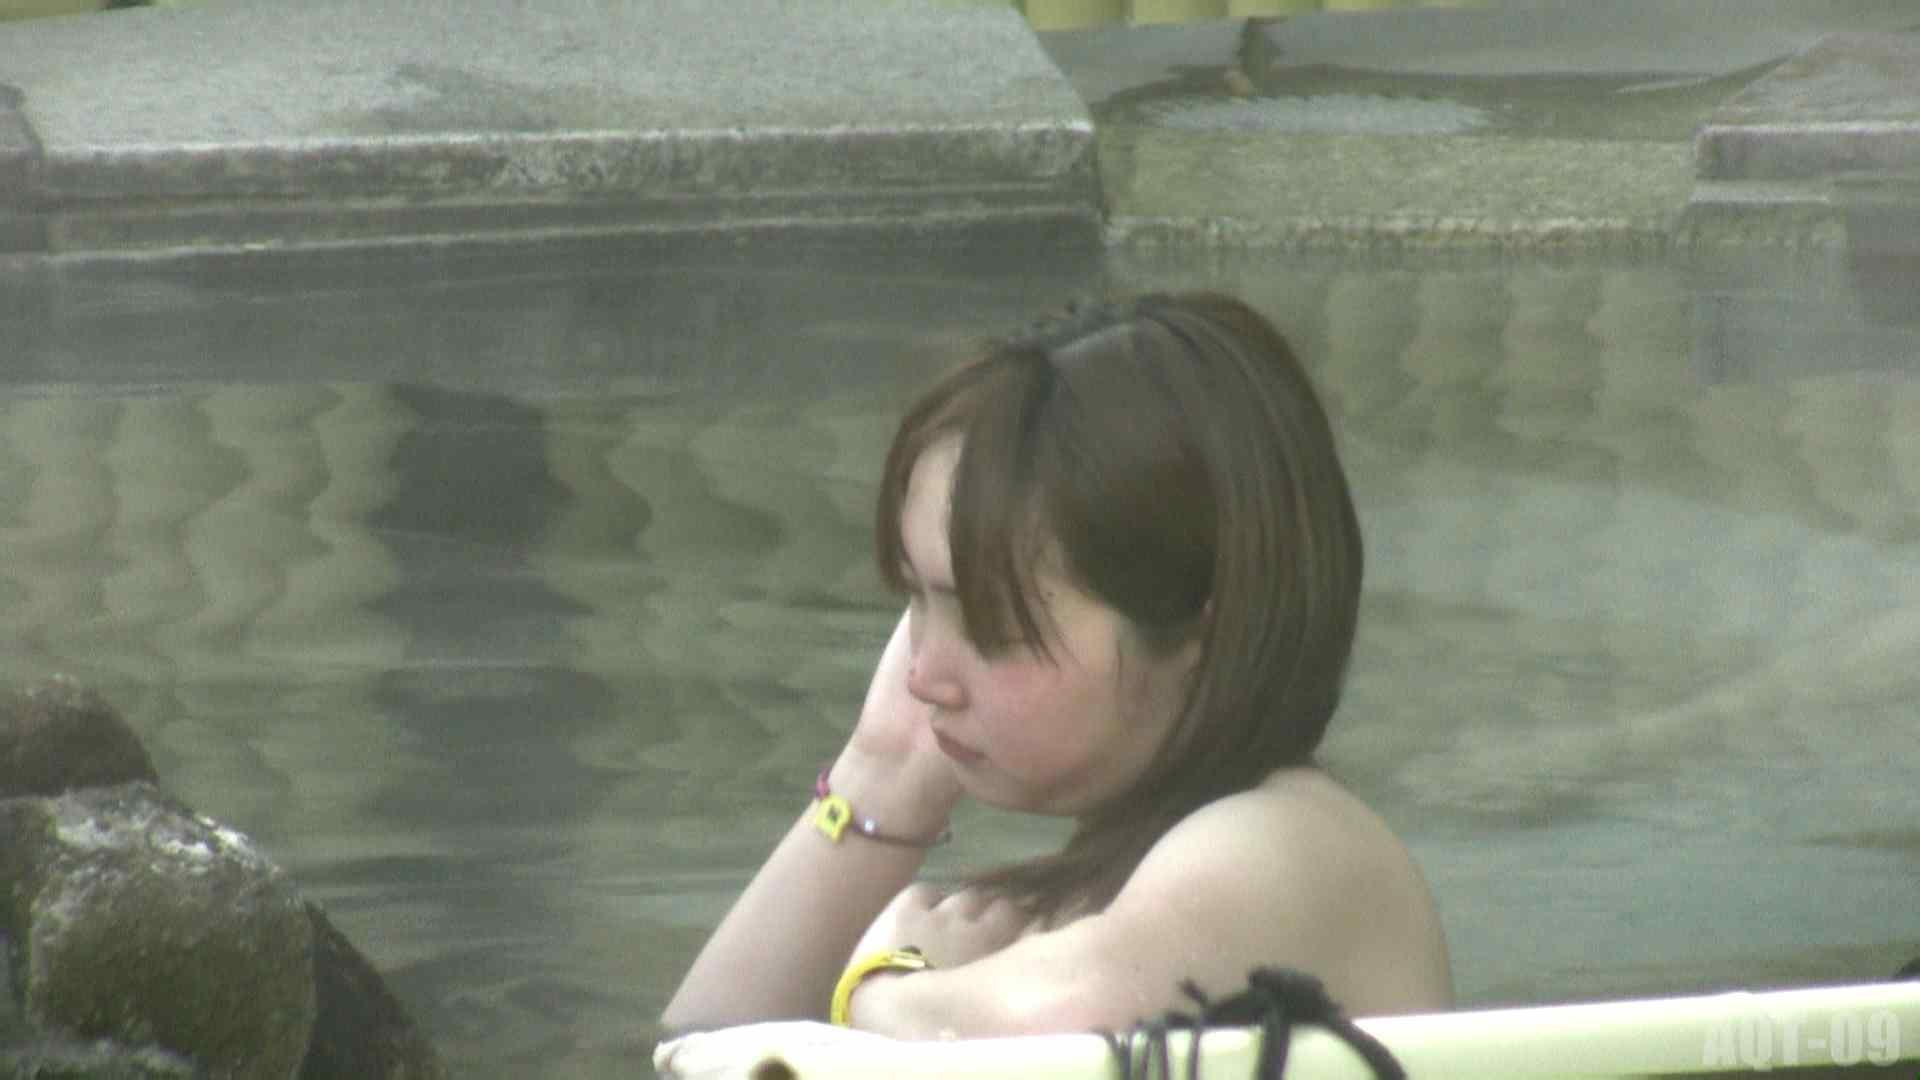 Aquaな露天風呂Vol.781 露天風呂   OLのエロ生活  93連発 52